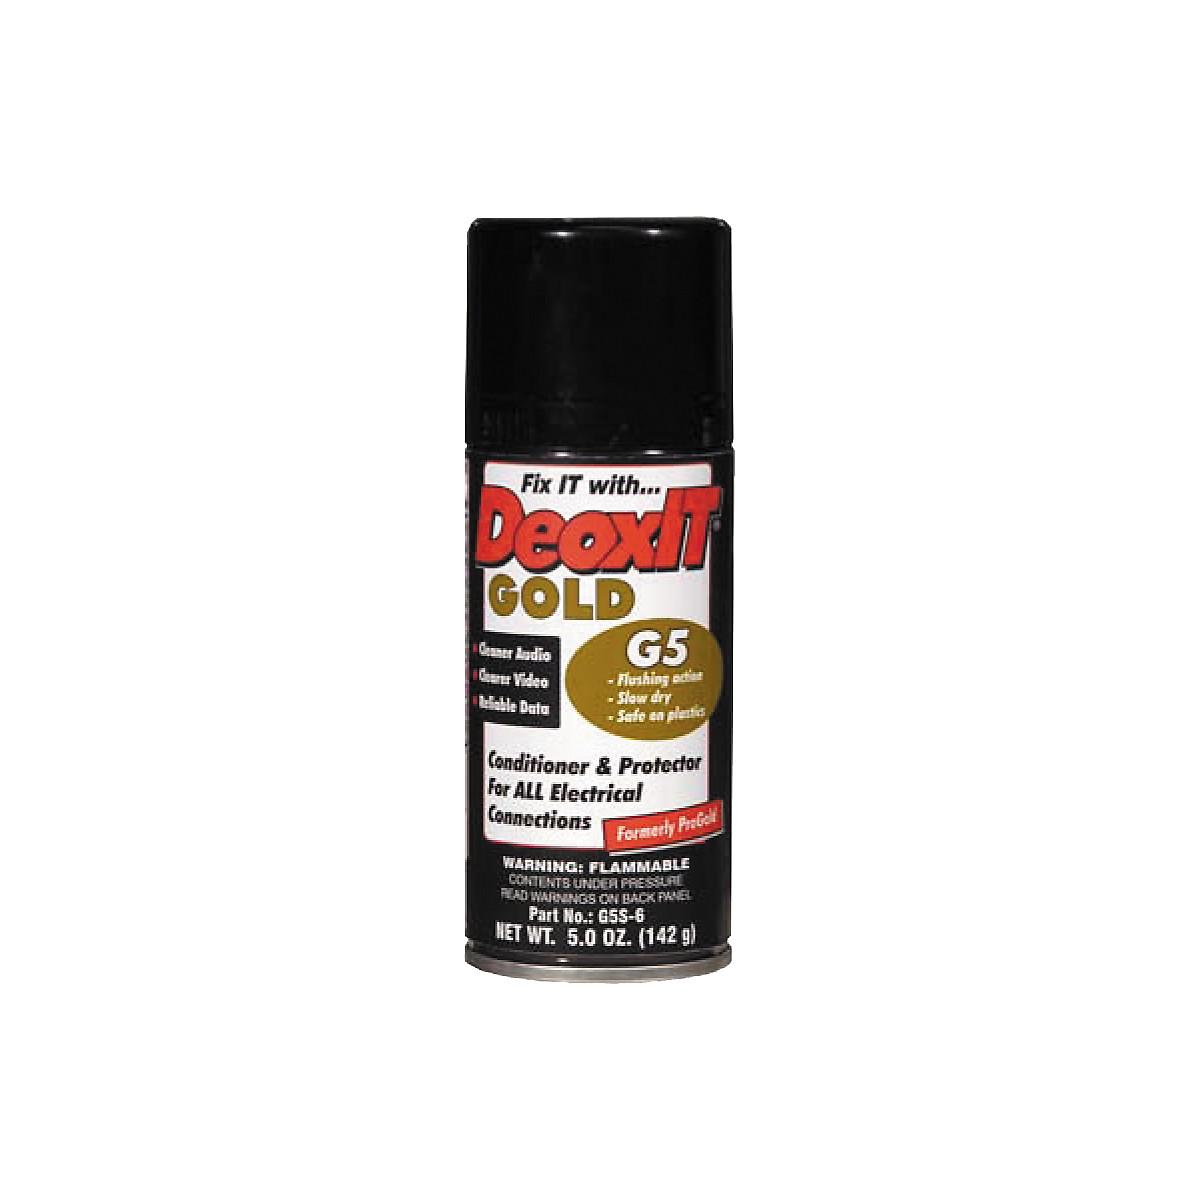 CAIG DeoxIT Gold G5 Spray Contact Conditioner 5 oz.